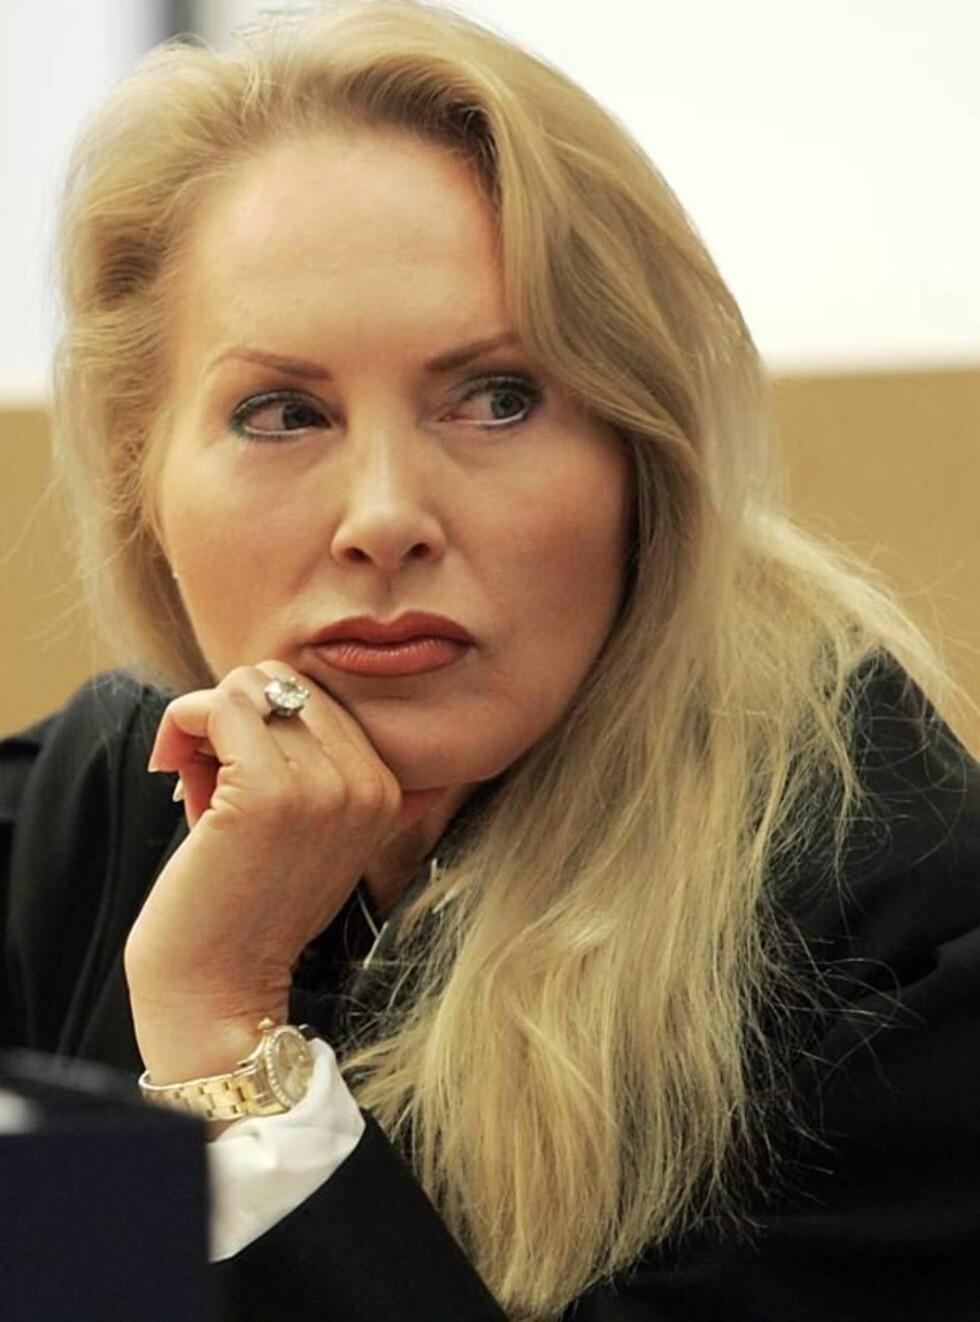 ADVOKATEN: Mona Høiness er filmkjendisens advokat. Foto: SCANPIX